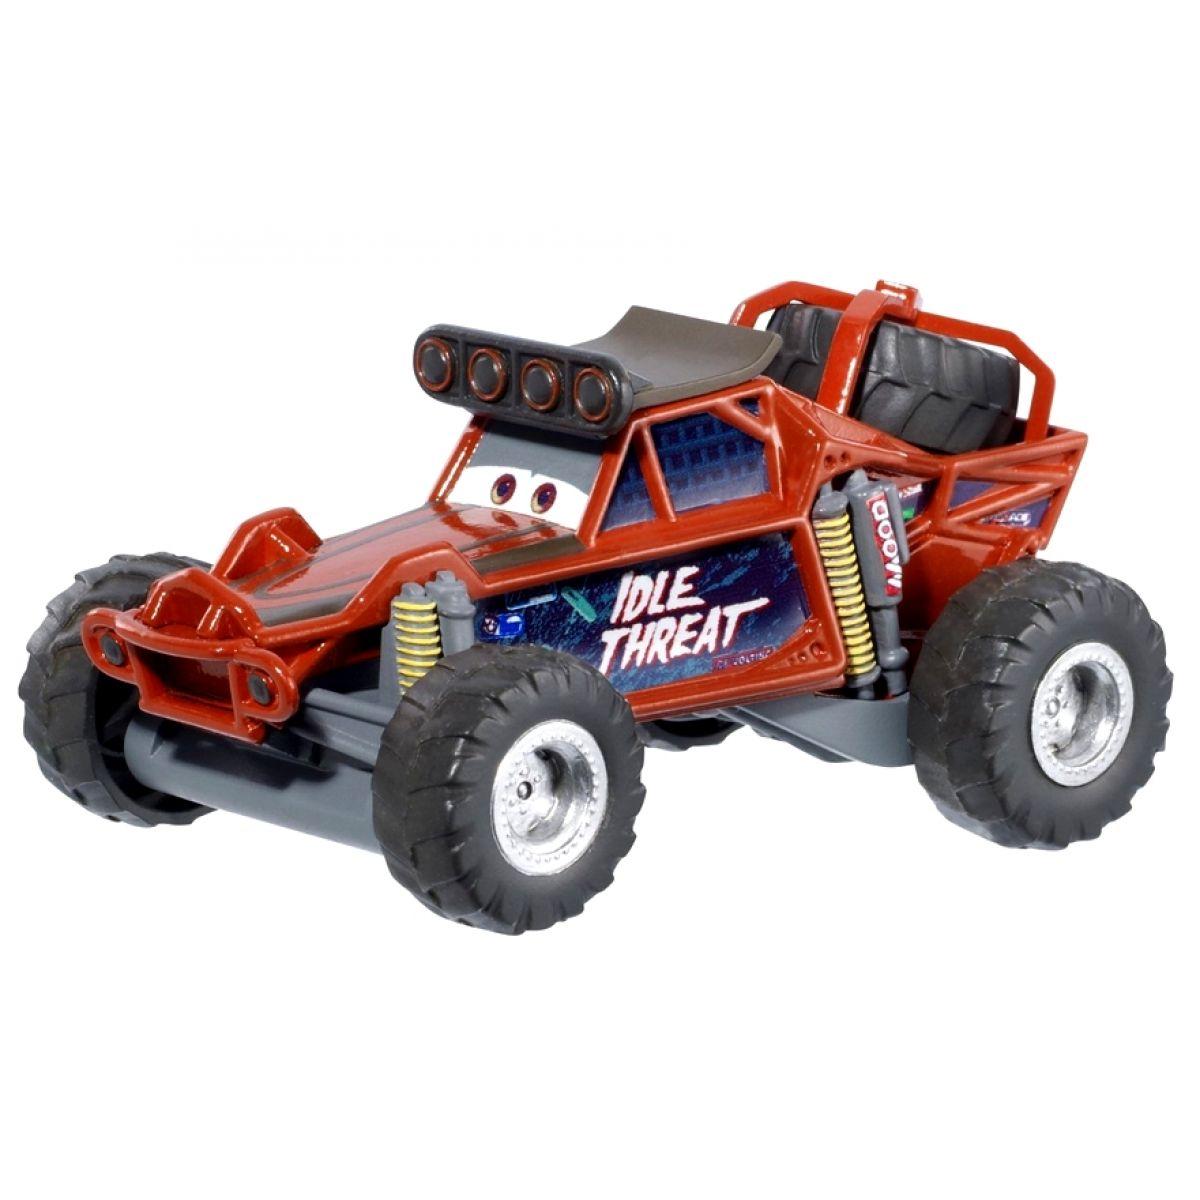 Mattel Cars RS 5 auto - Idle Threat